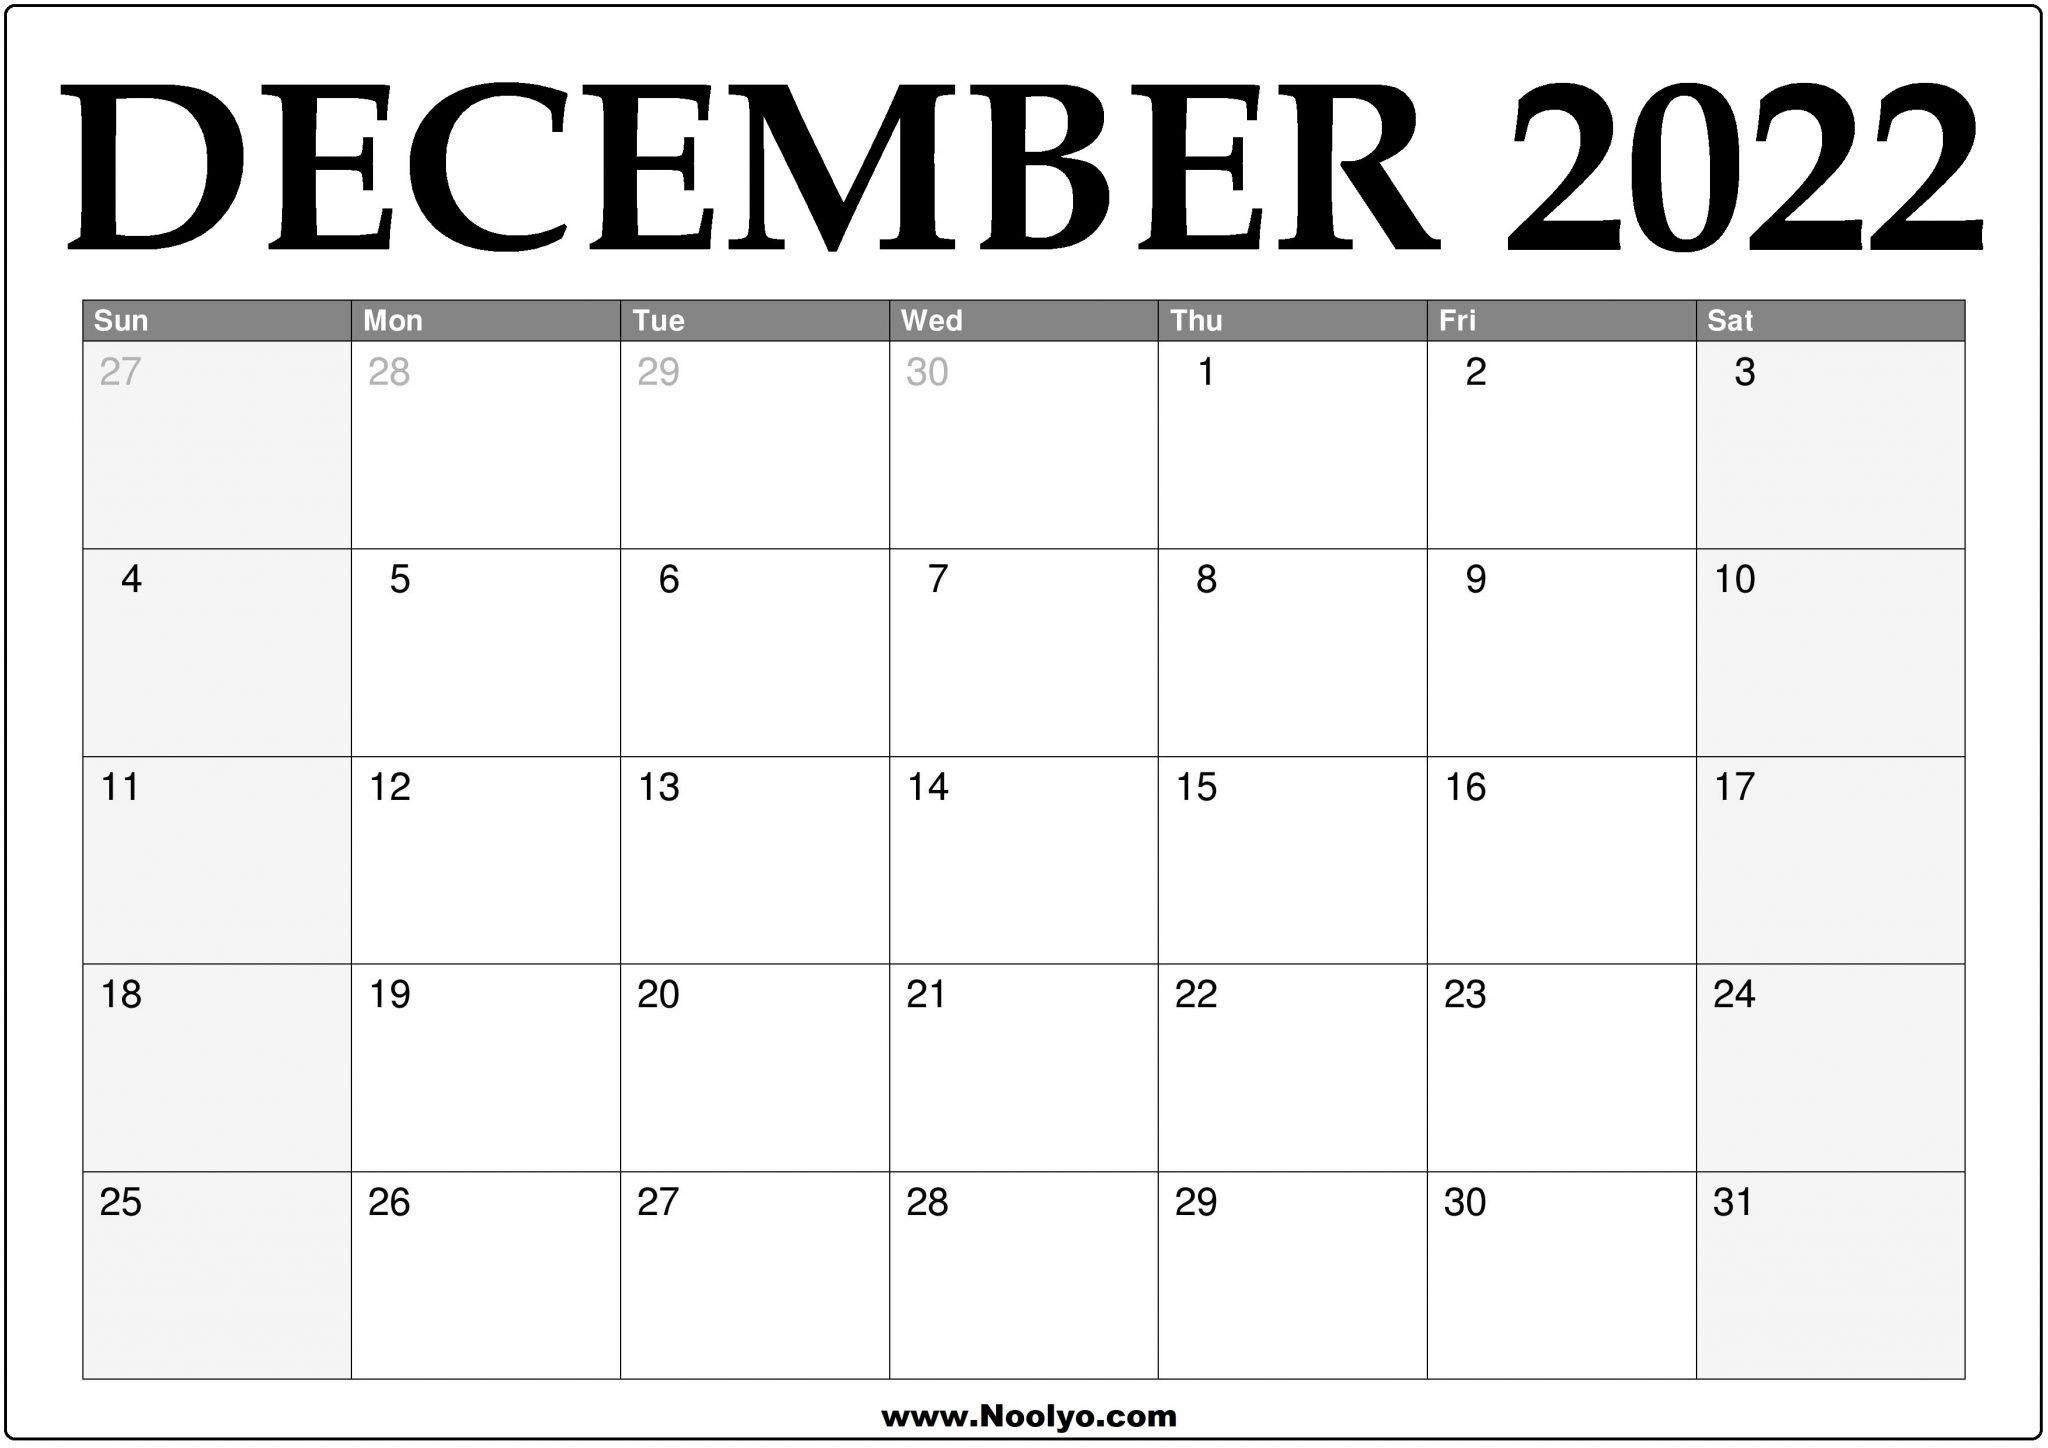 2022 December Calendar Printable - Download Free - Noolyo.com